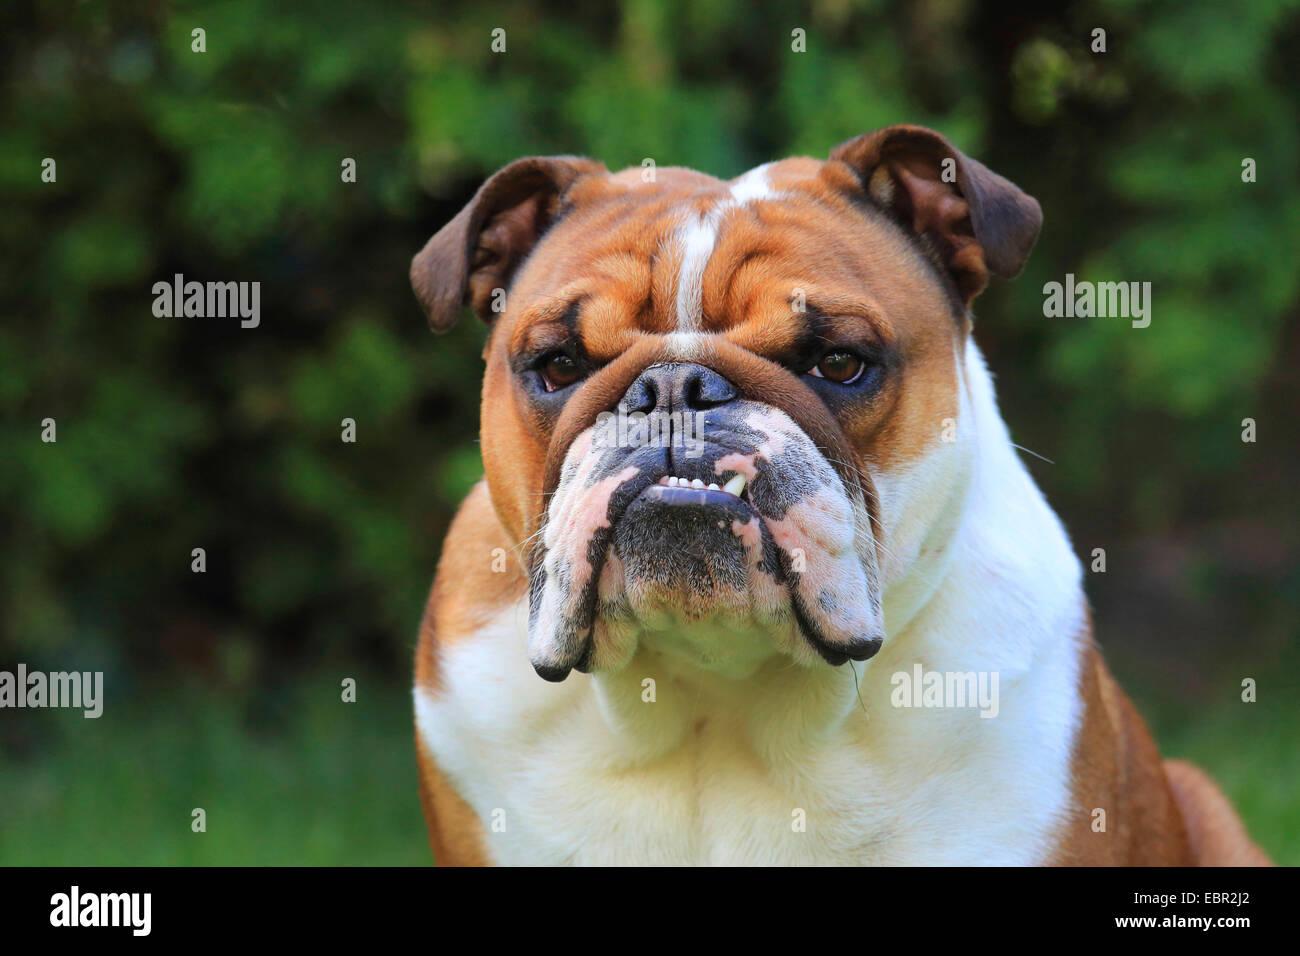 English bulldog (Canis lupus f. familiaris), portrait, Germany - Stock Image